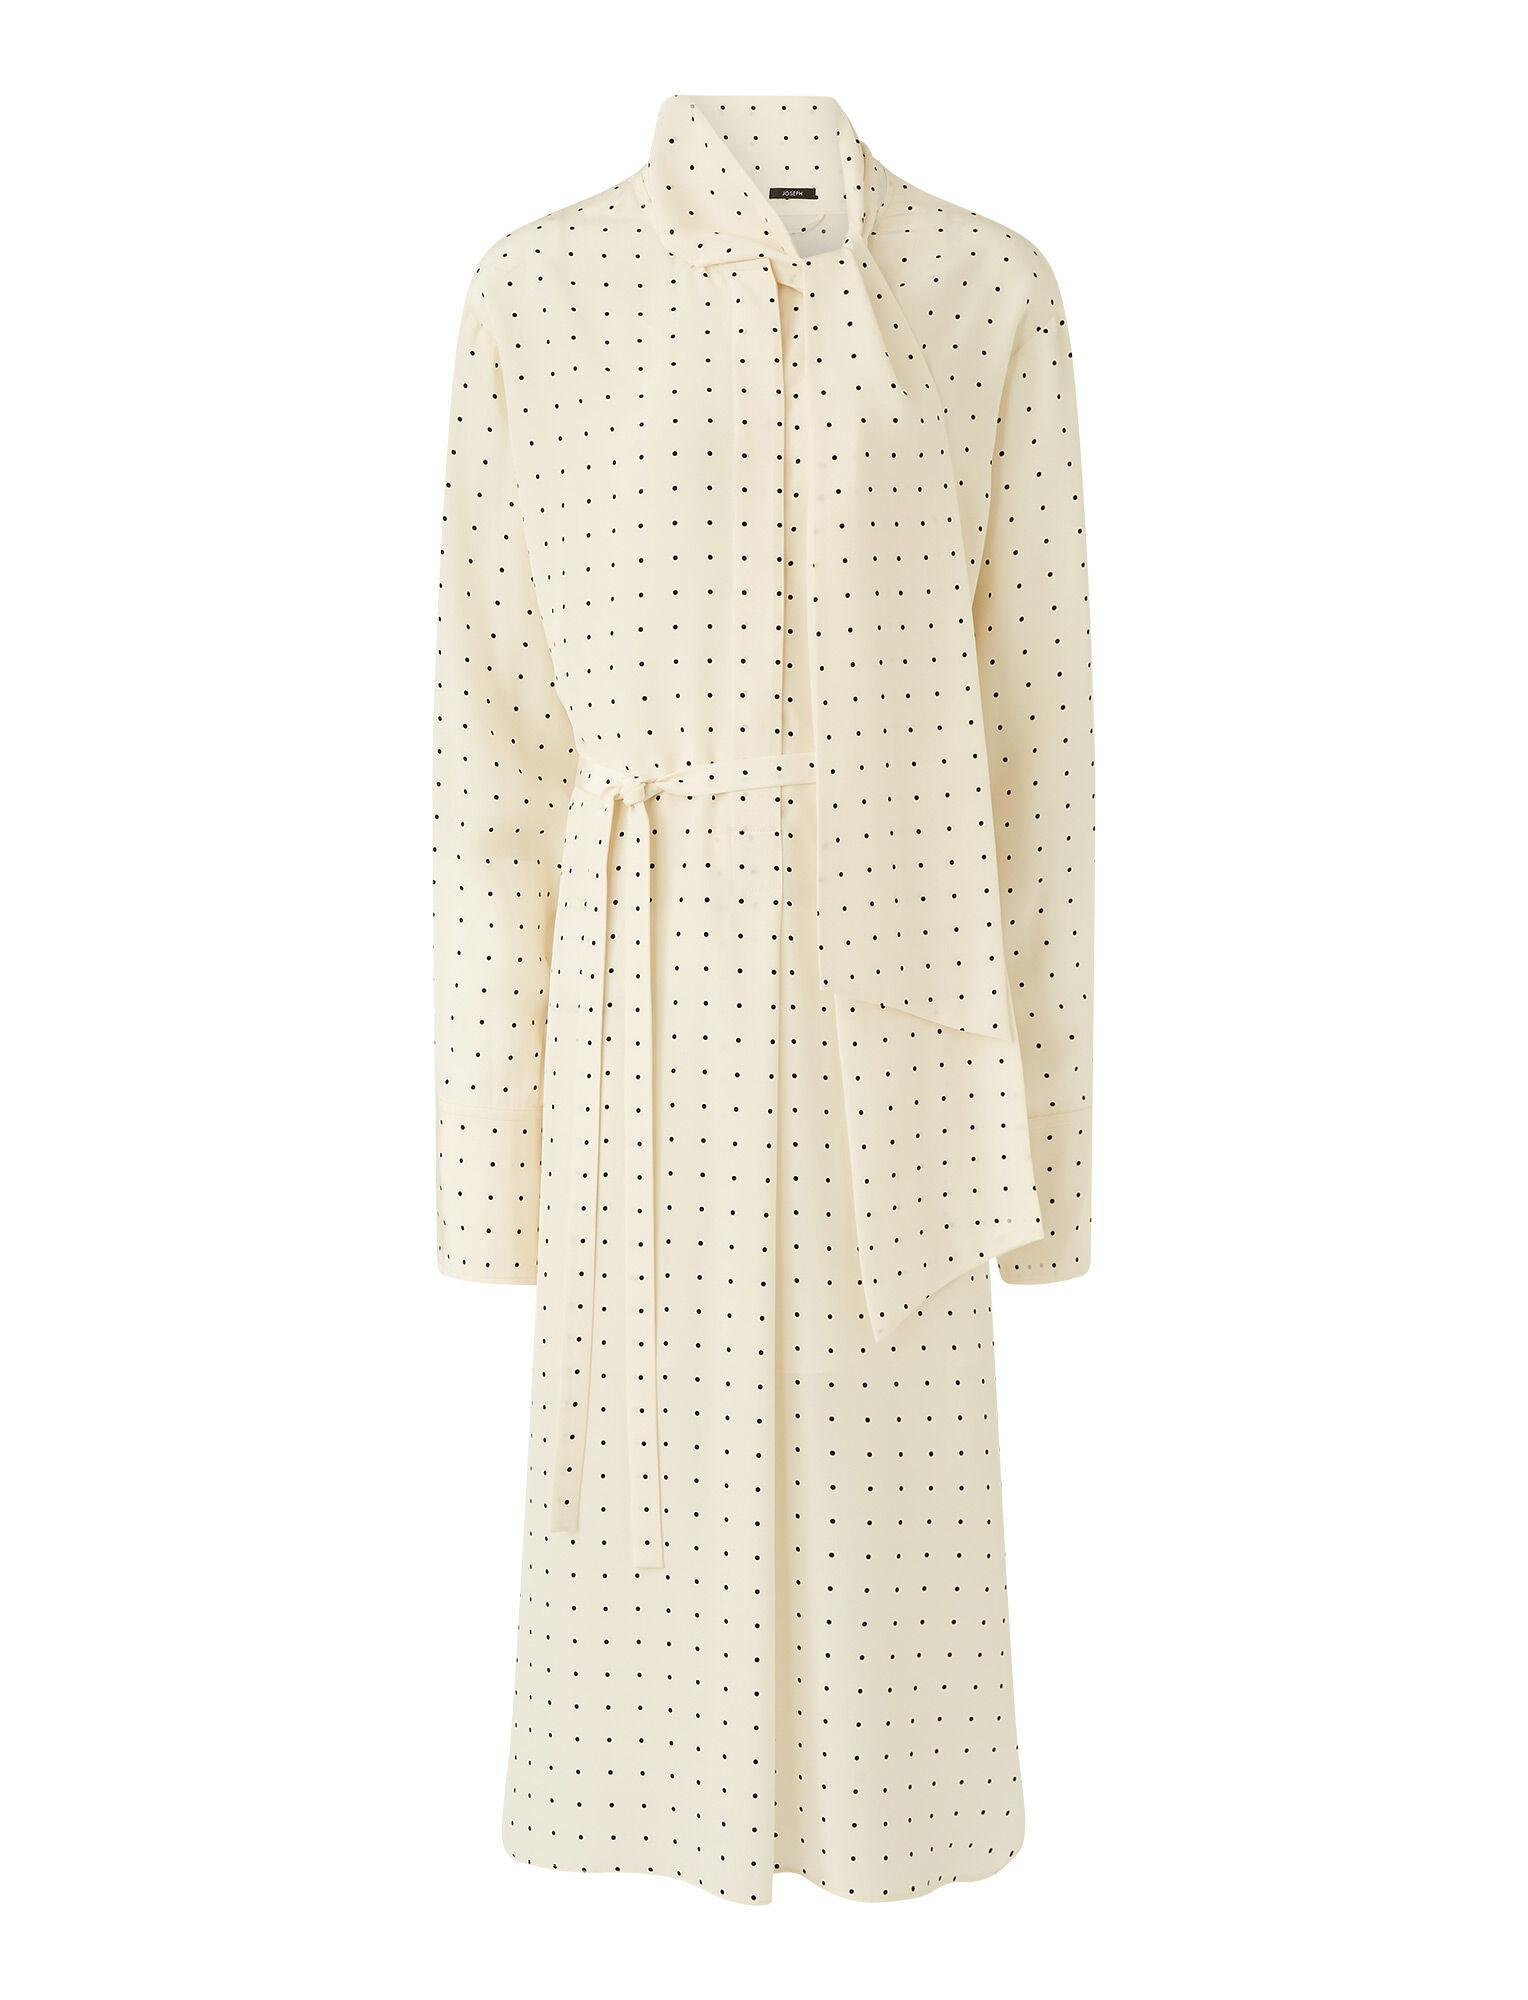 Joseph, Silk Polkadot Doriane Dress, in IVORY/BLACK